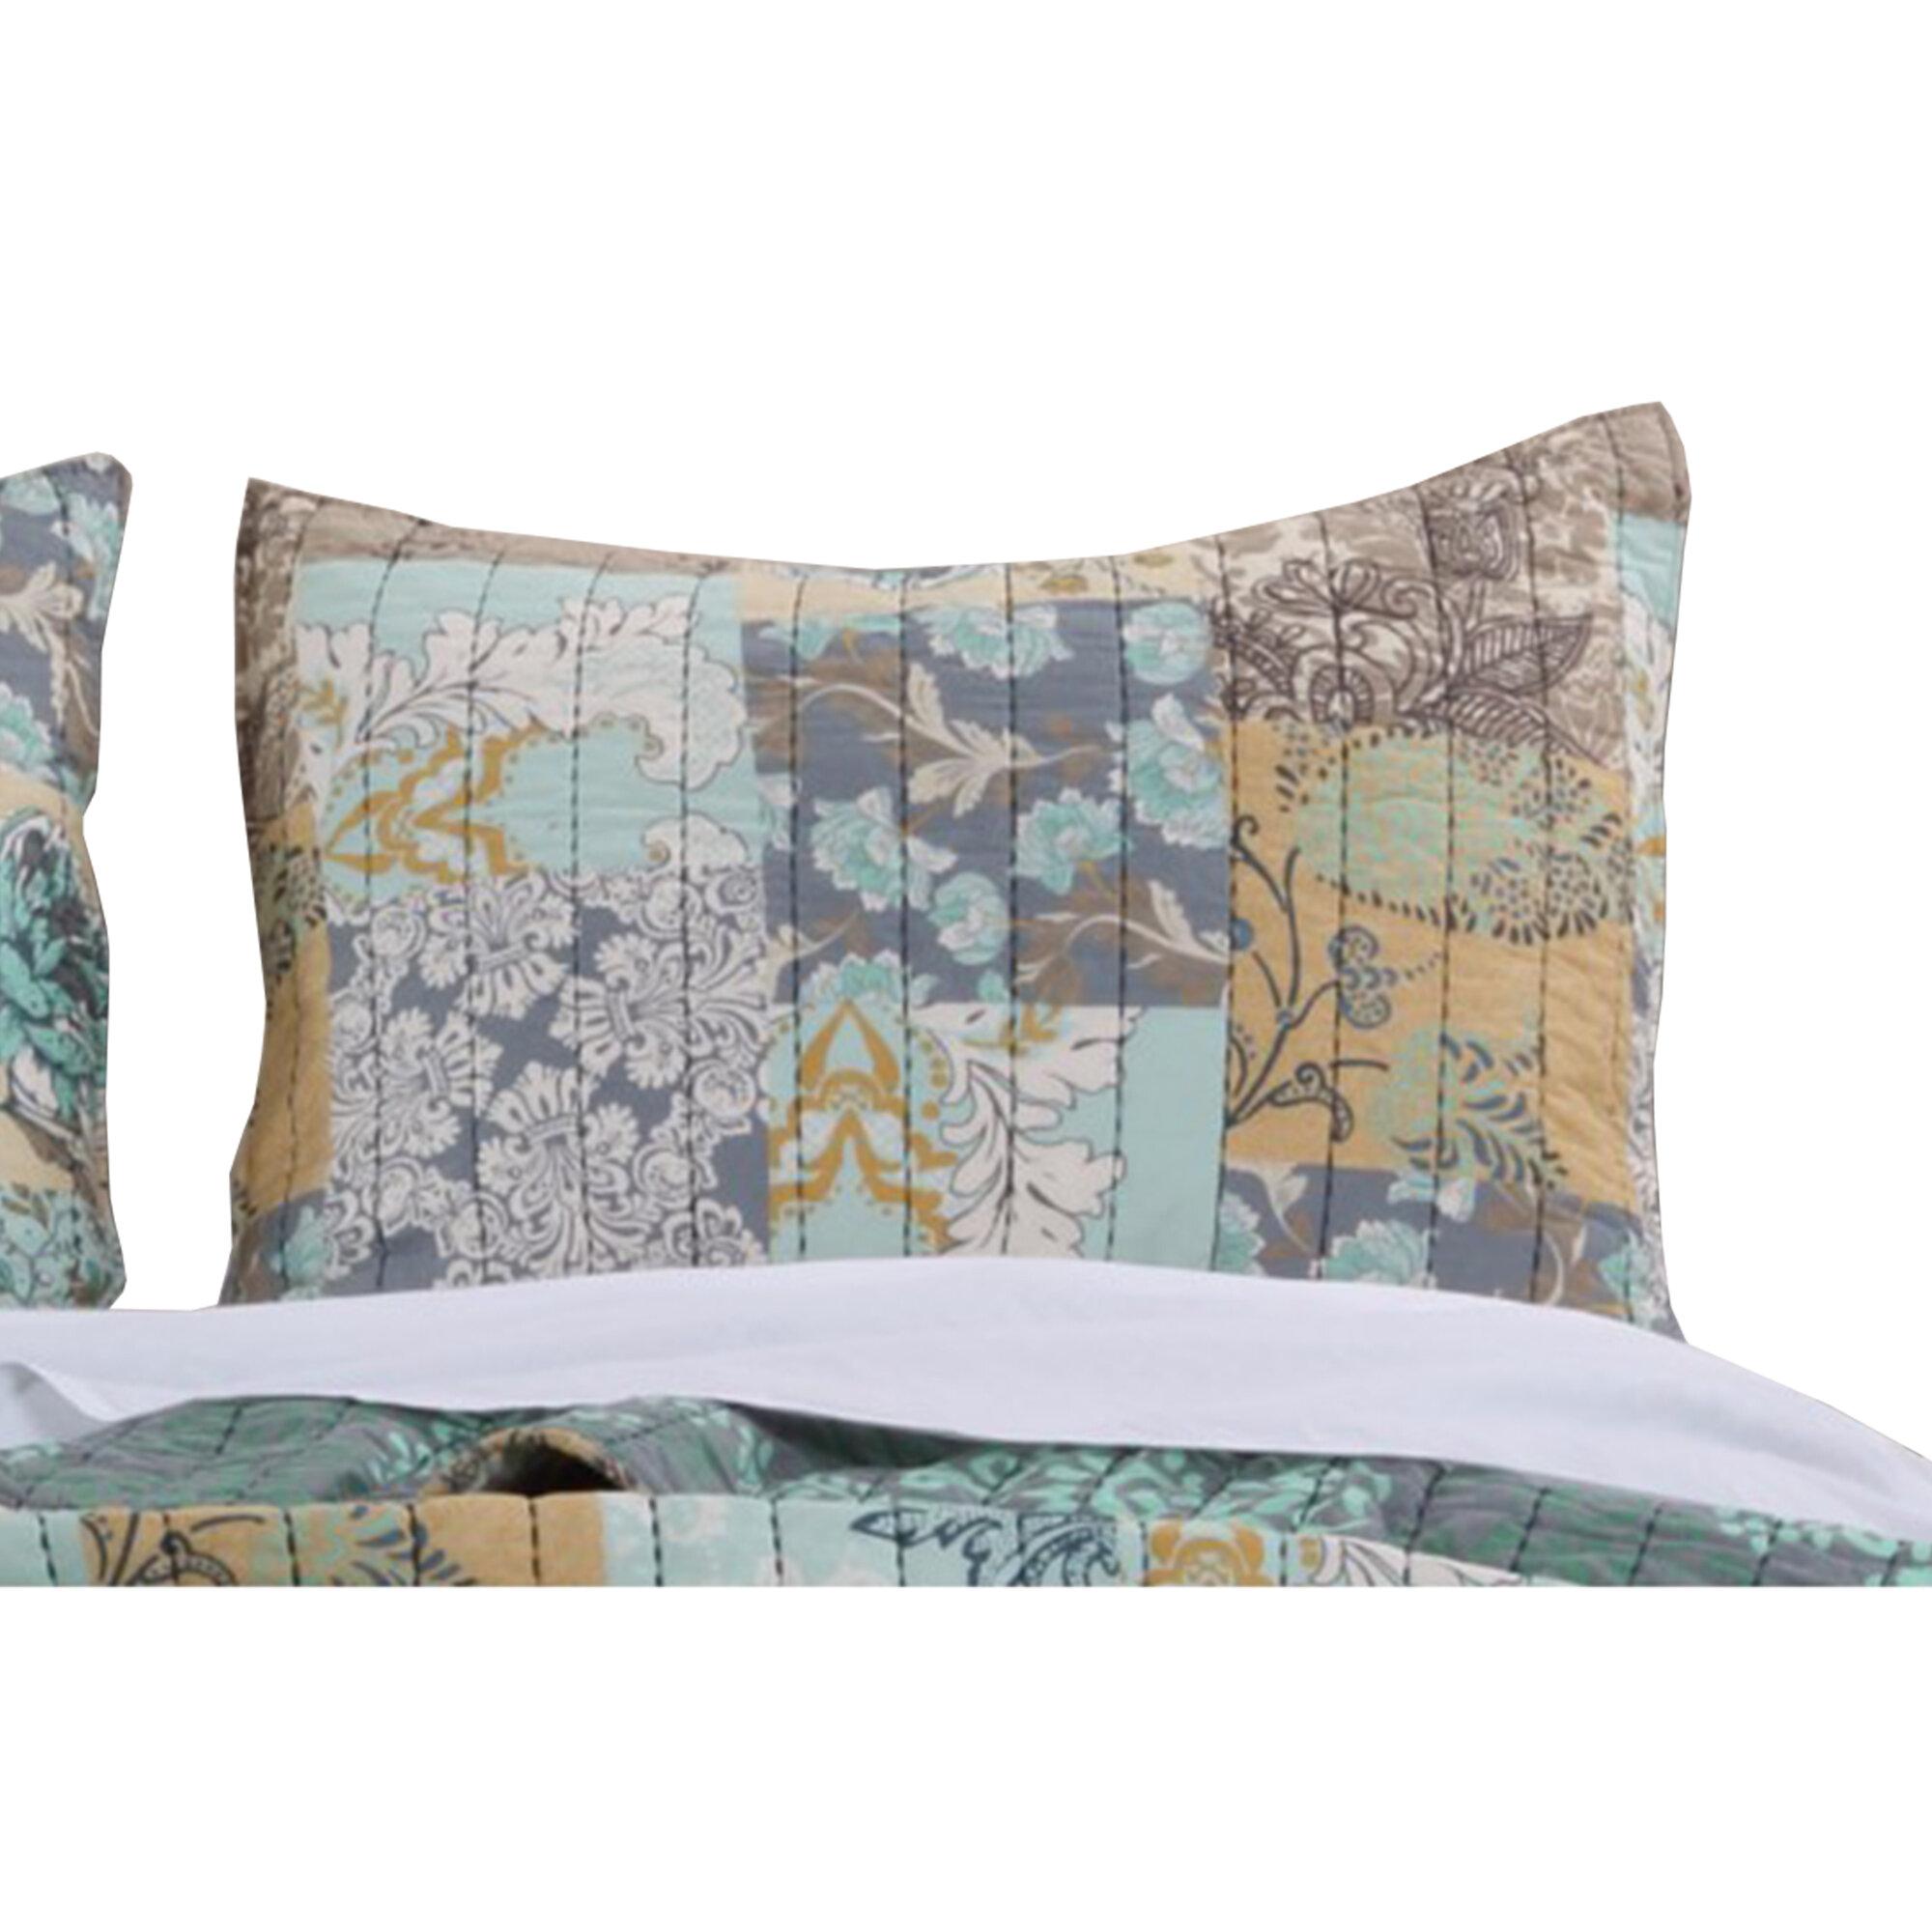 Alcott Hill Schroder Cotton Blend Envelope Sham Wayfair